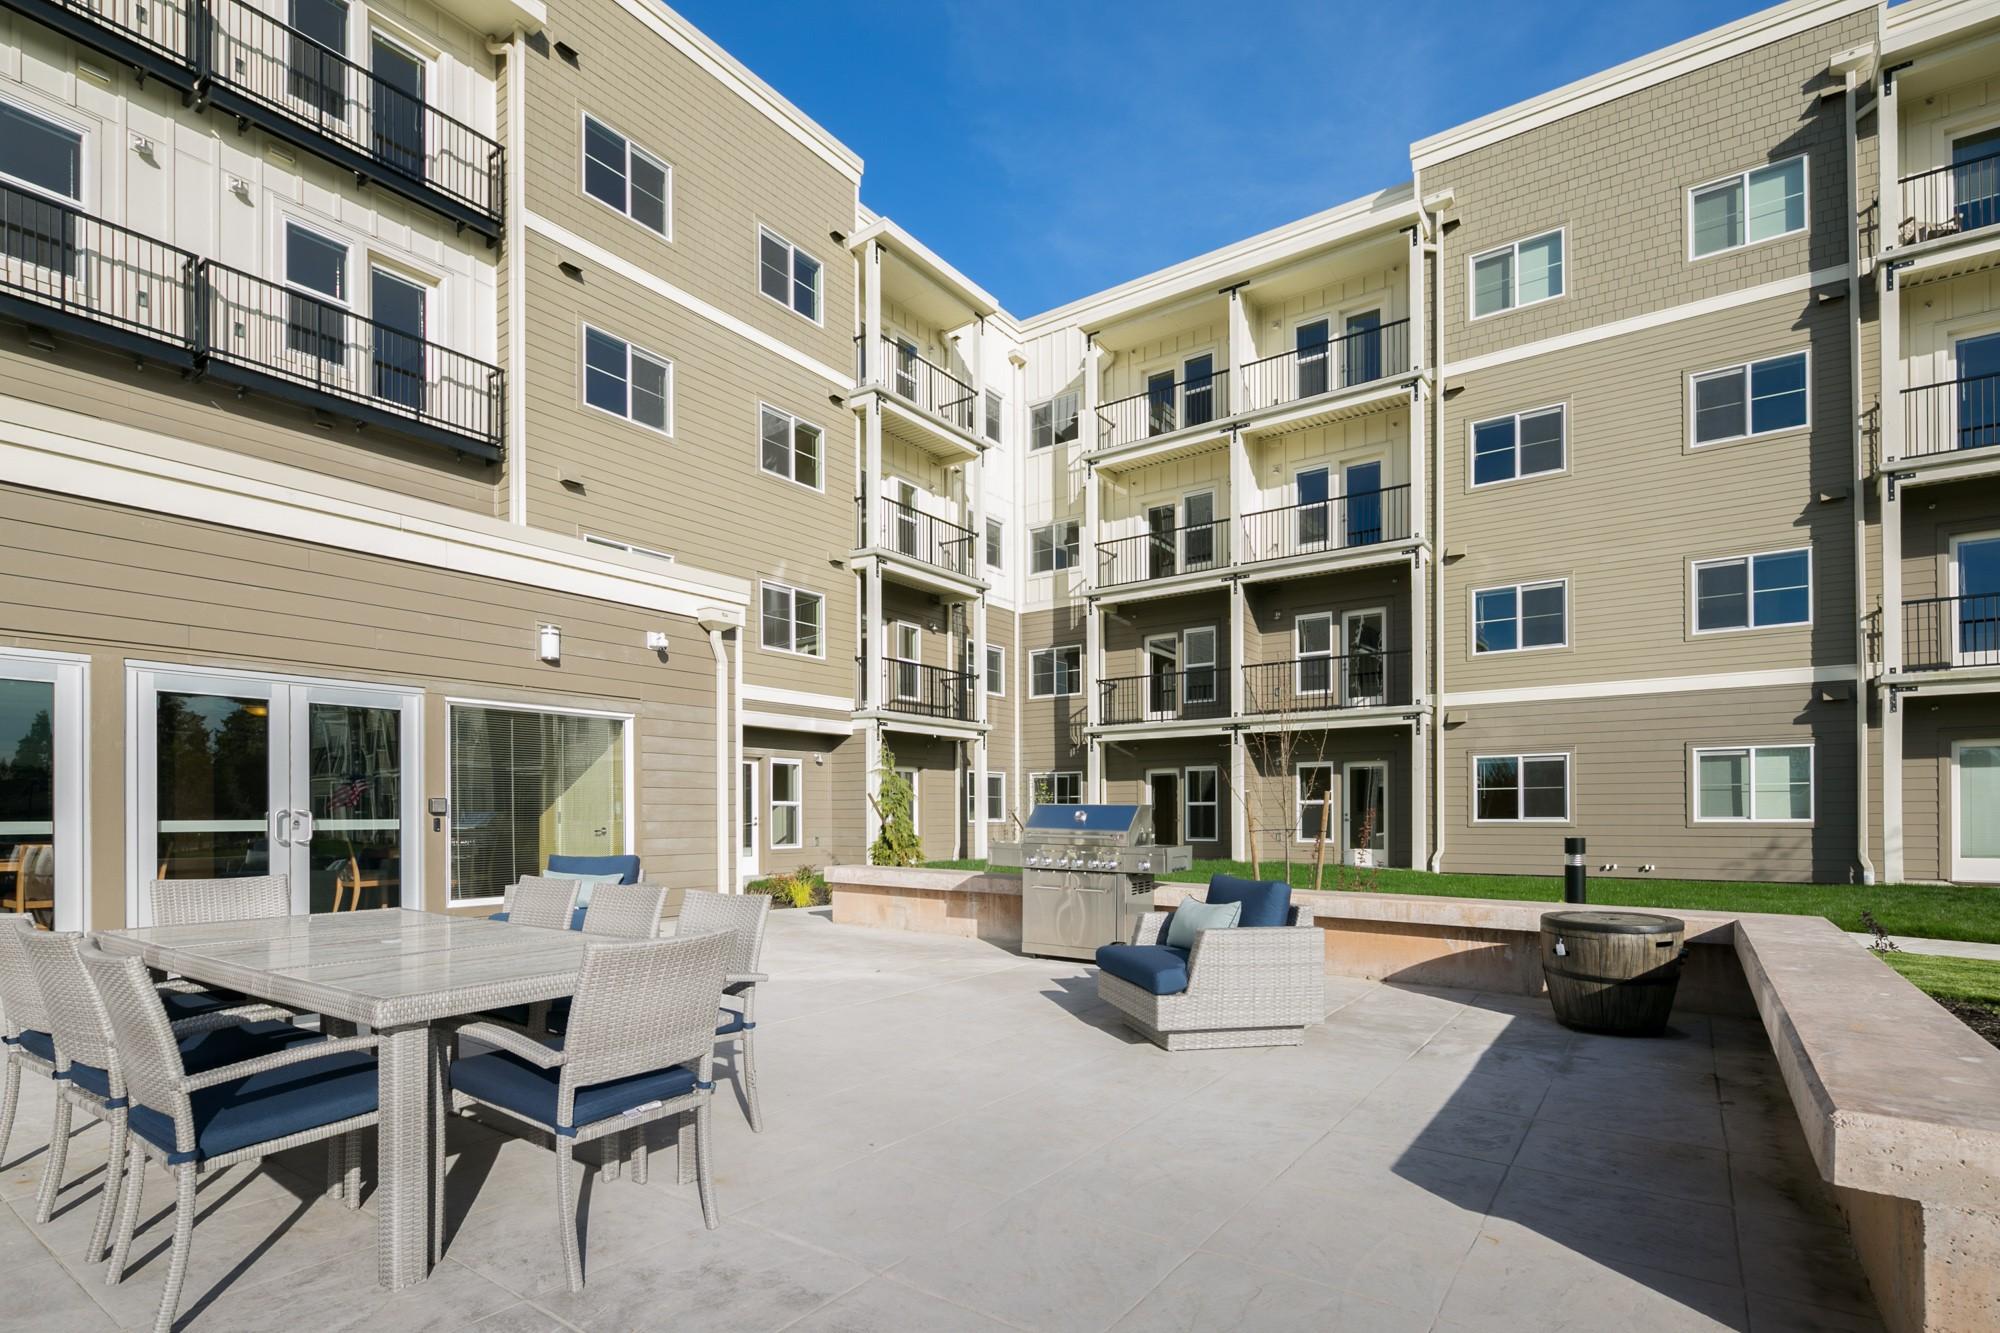 Apartments Near Green River Estates at Hillside Gardens for Green River Community College Students in Auburn, WA